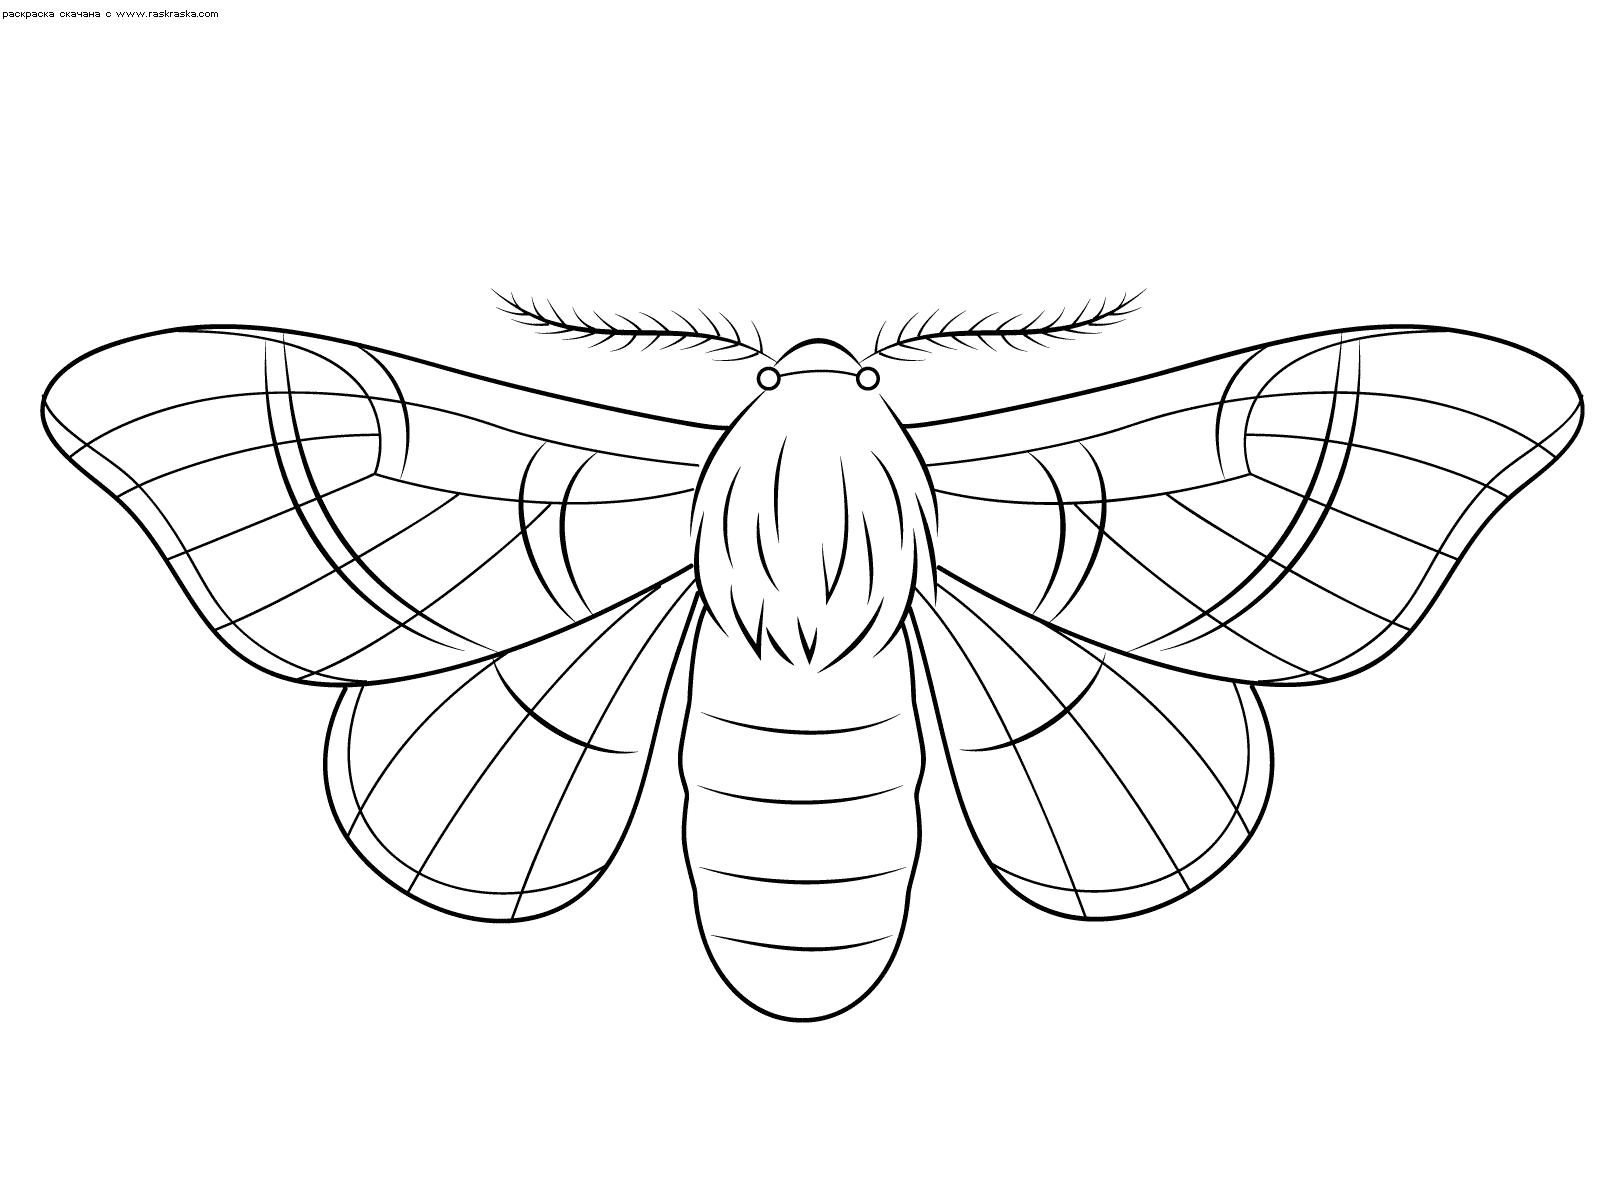 Раскраска Мотылек. Раскраска бабочка, мотылек